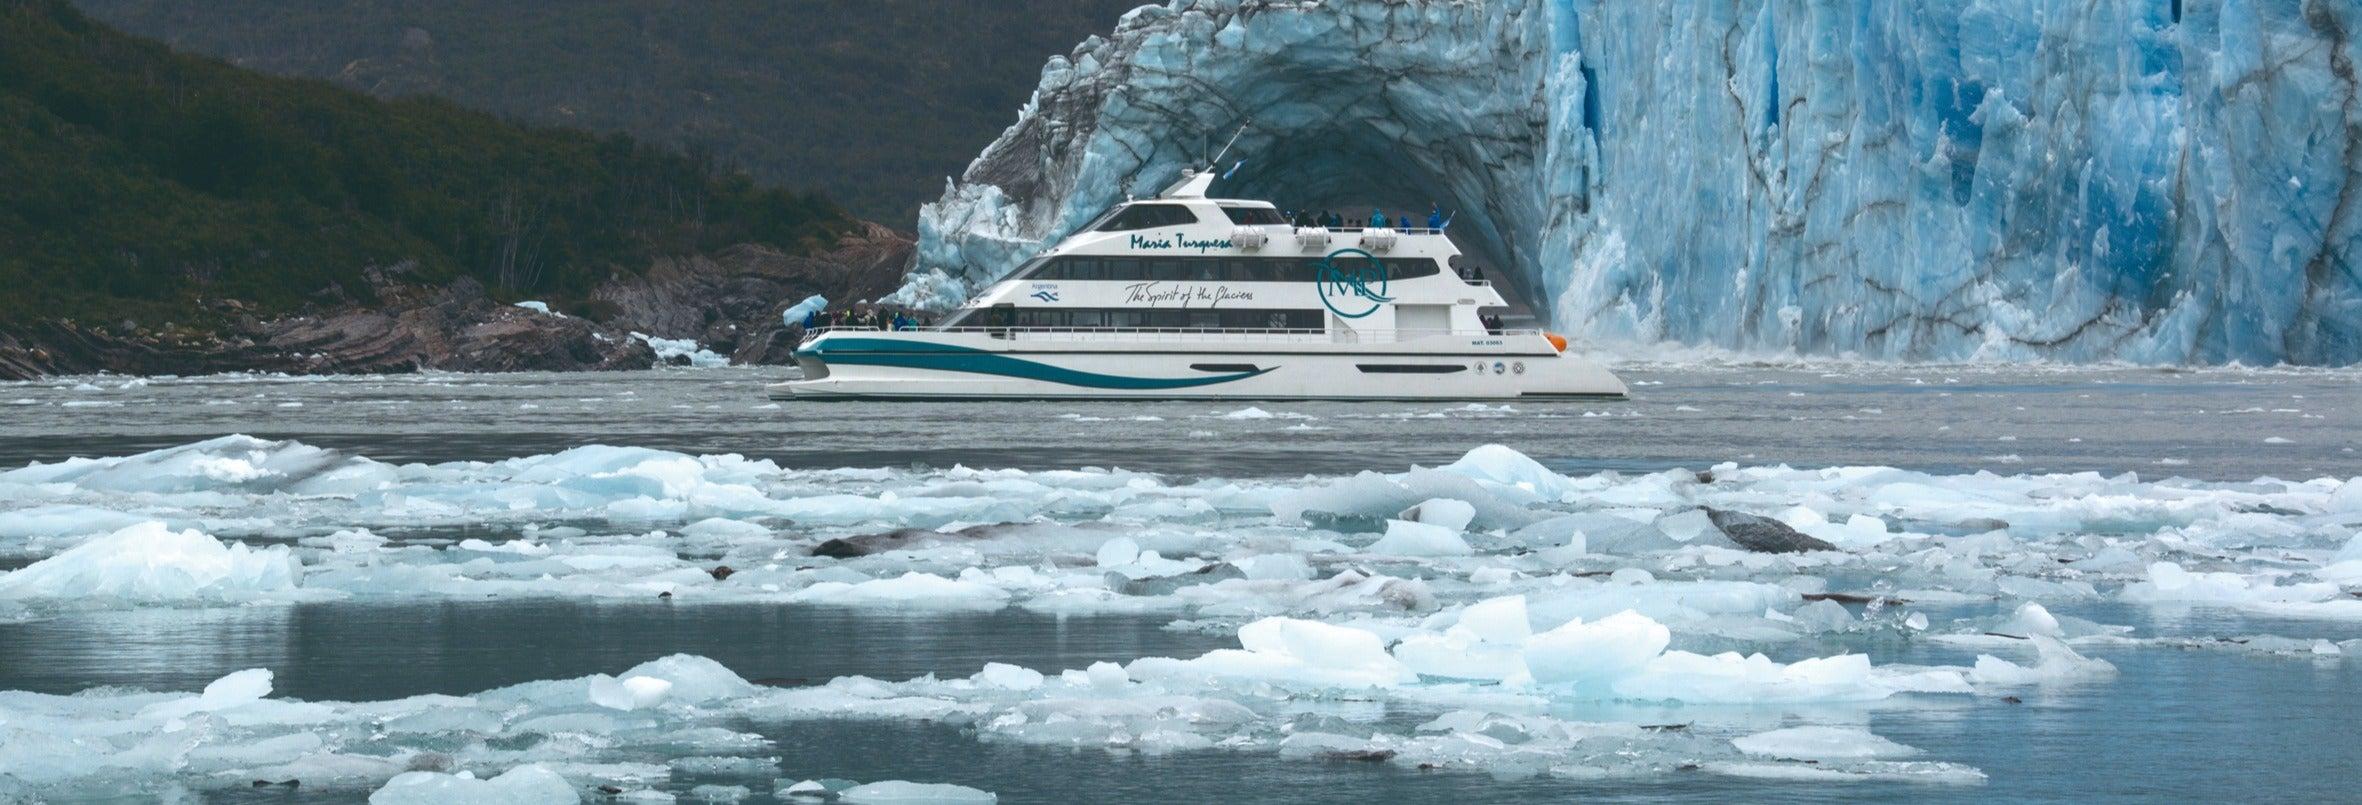 Patagonia Glacier Cruise